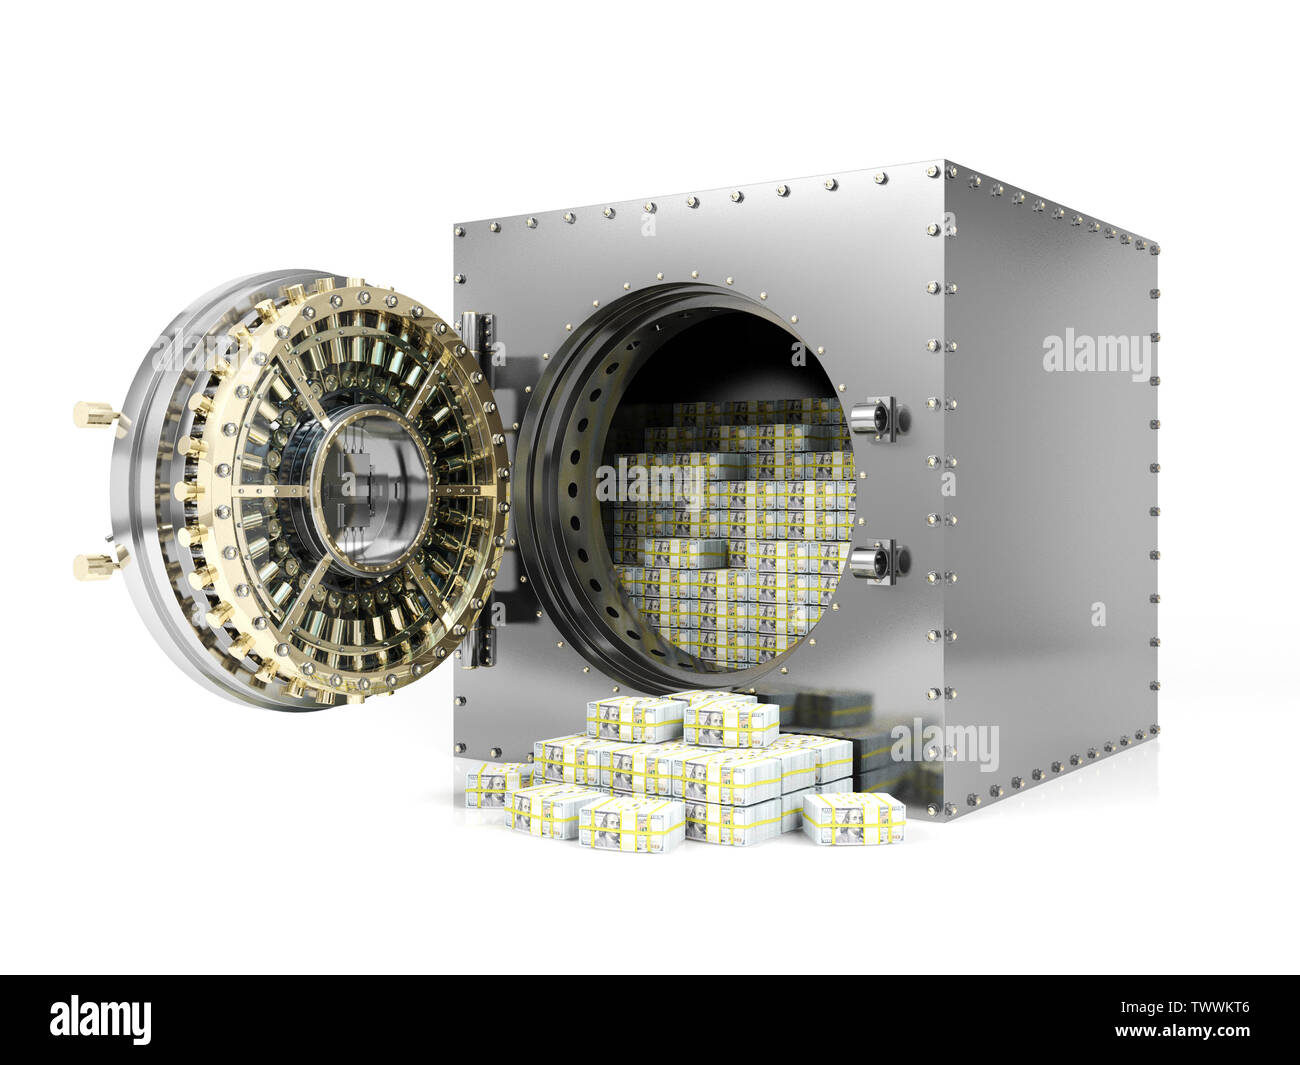 Bank safe deposit box and opened bank vault door revealing dollar banknote stacks, 3D Rendering - Stock Image